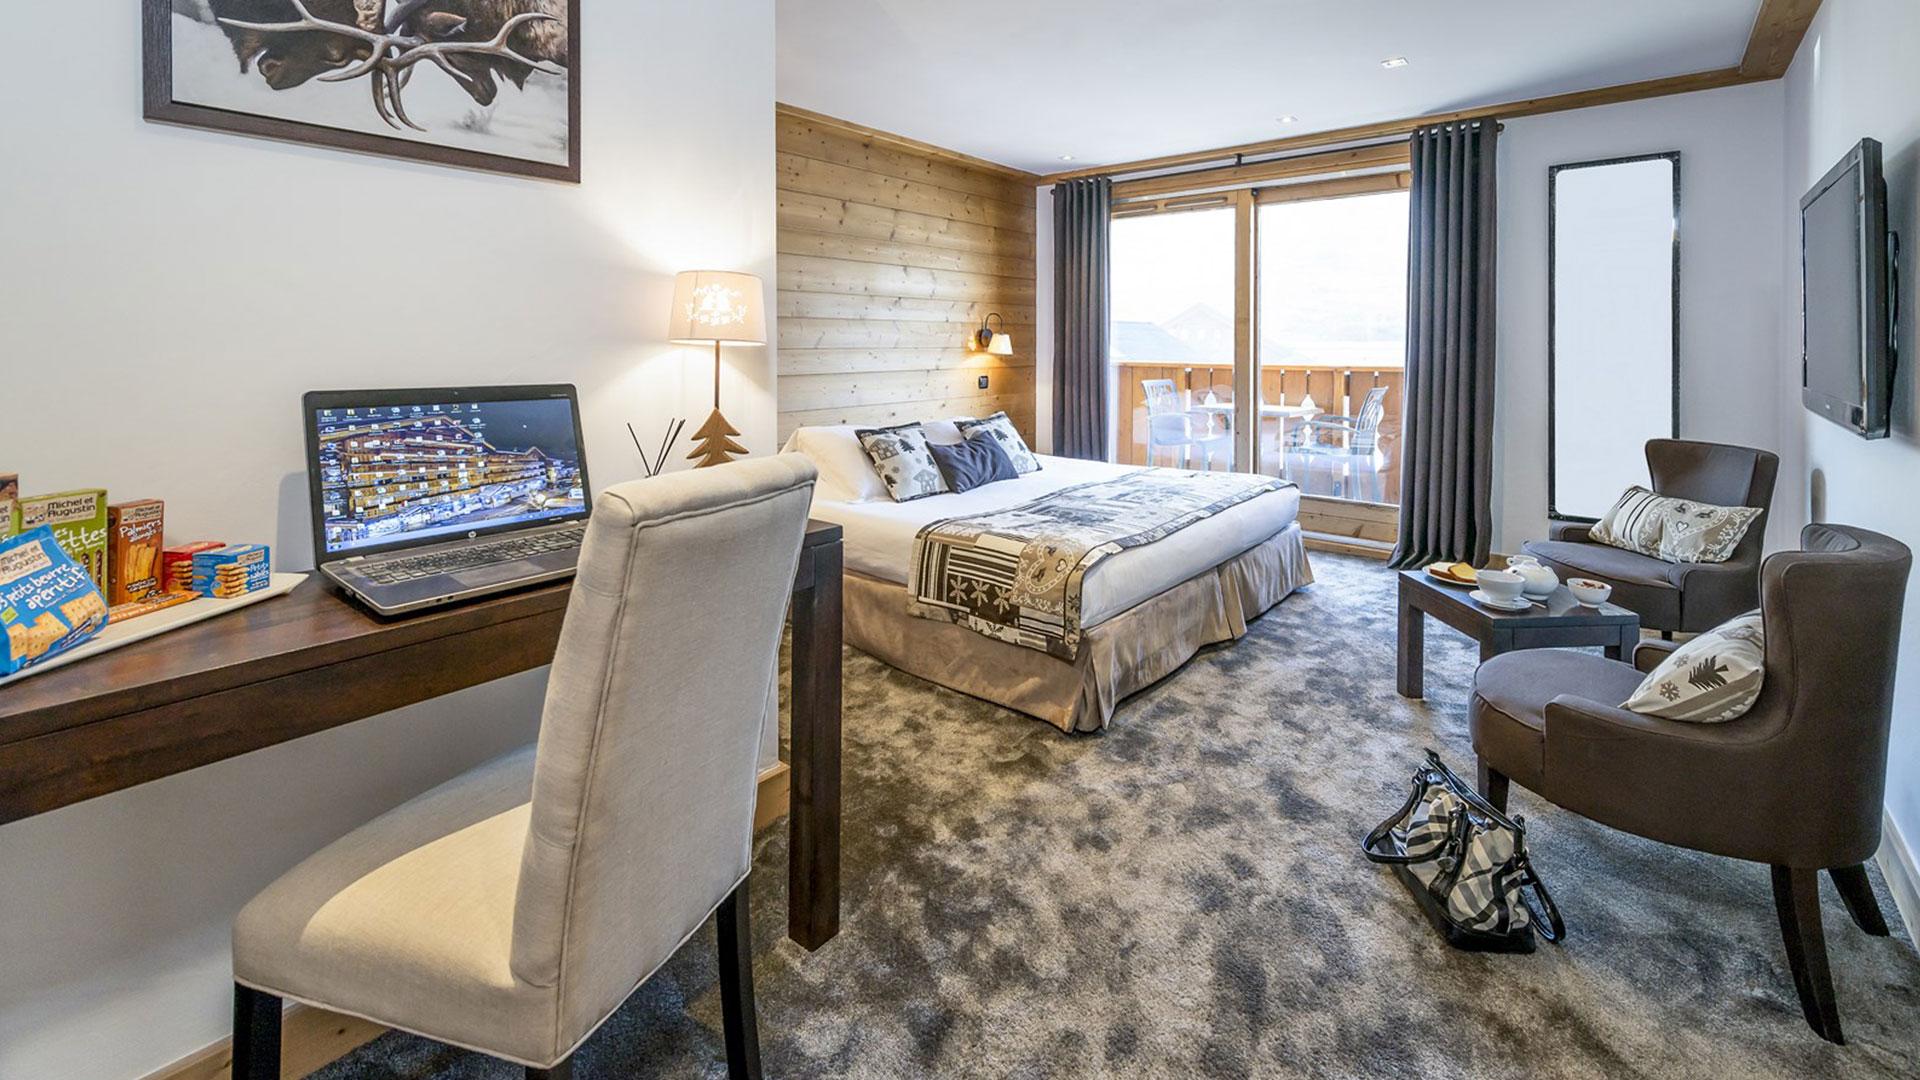 h tel de charme m ribel la chaudanne 4 toiles. Black Bedroom Furniture Sets. Home Design Ideas